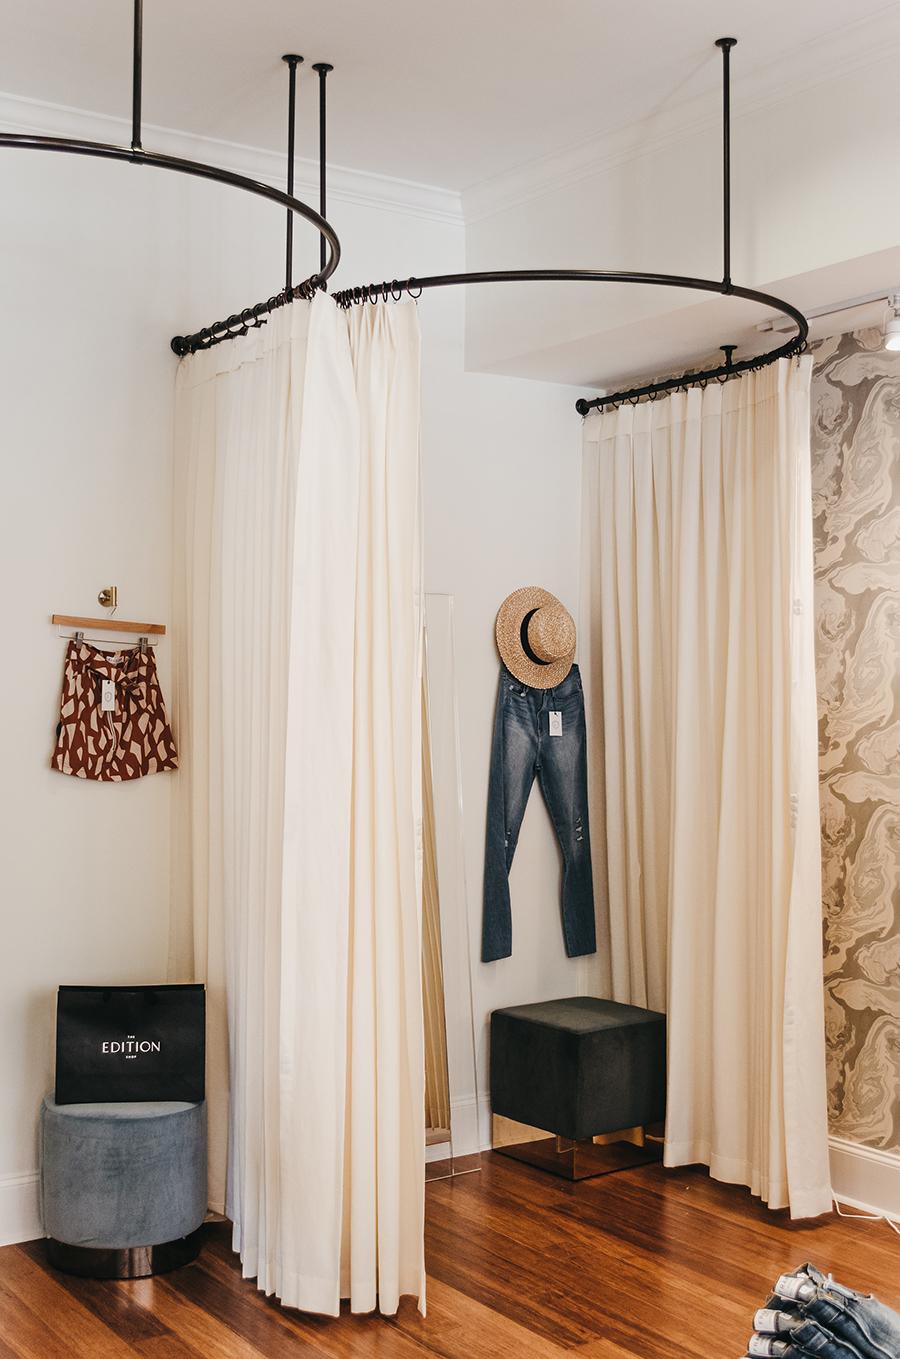 flourish-collaborative-edition-shop-savannah-dressing-rooms.jpg